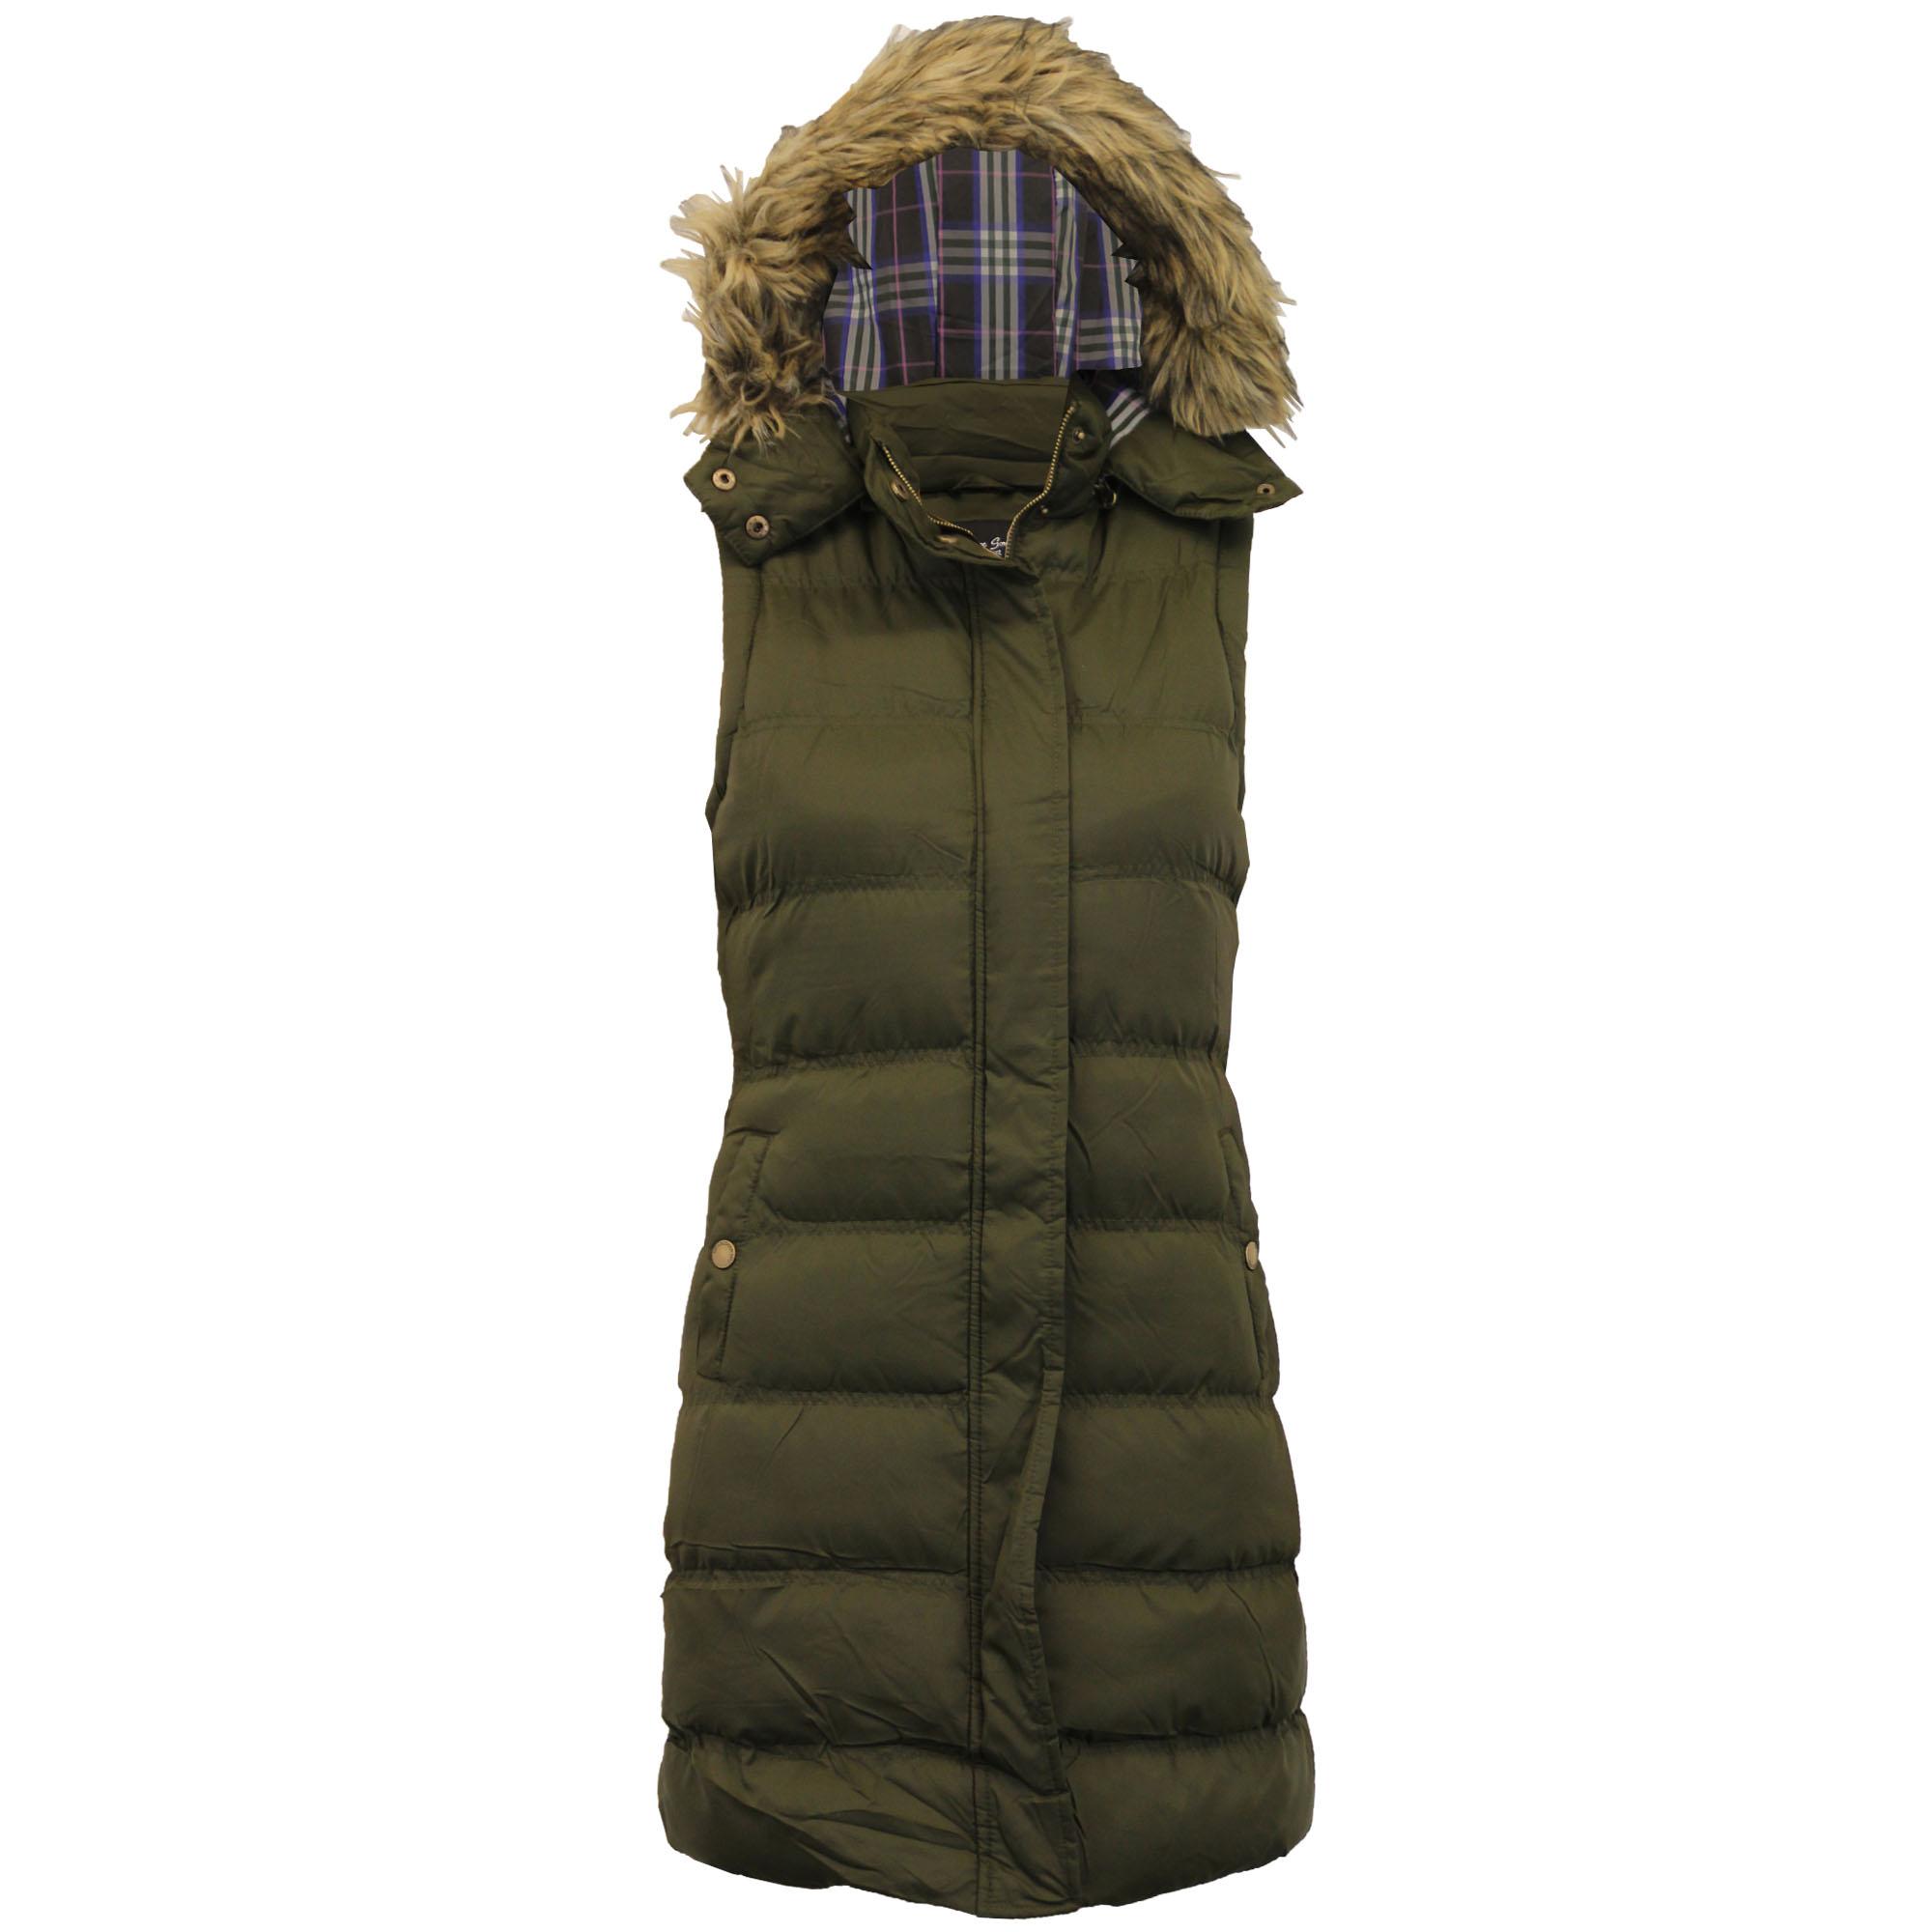 ladies long gilet brave soul womens bodywarmer hooded quilted padded fur winter ebay. Black Bedroom Furniture Sets. Home Design Ideas